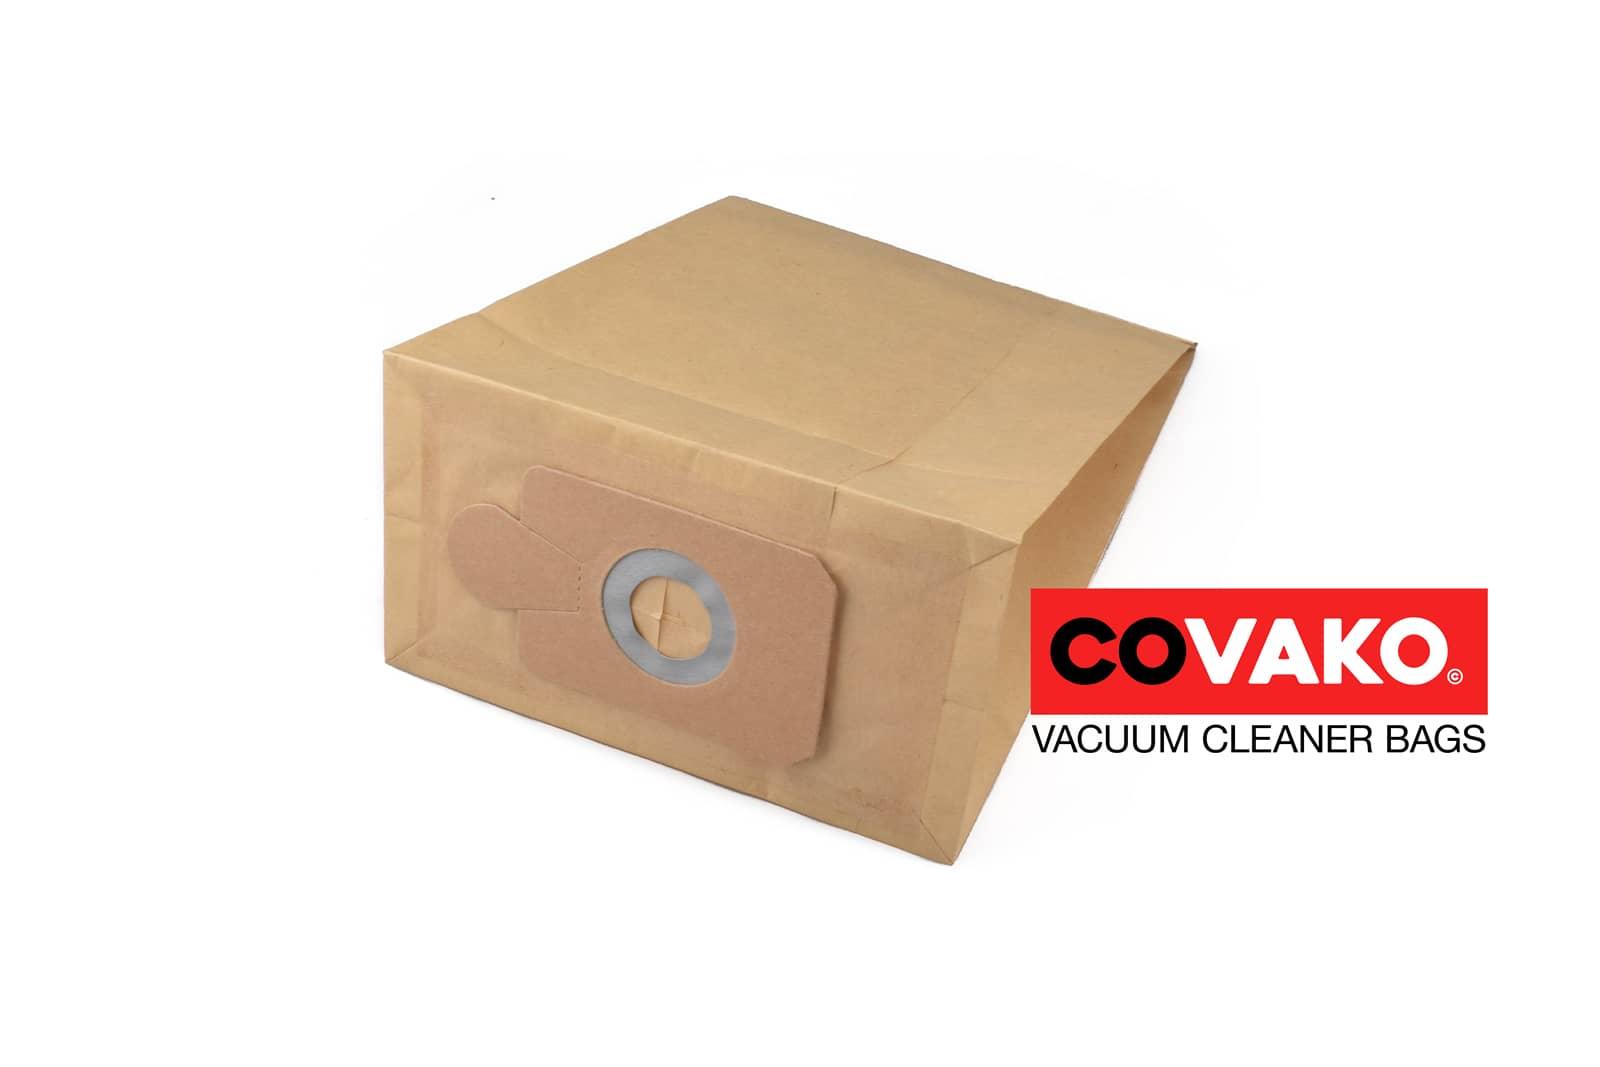 Numatic PPR 240-11 / Paper - Numatic vacuum cleaner bags